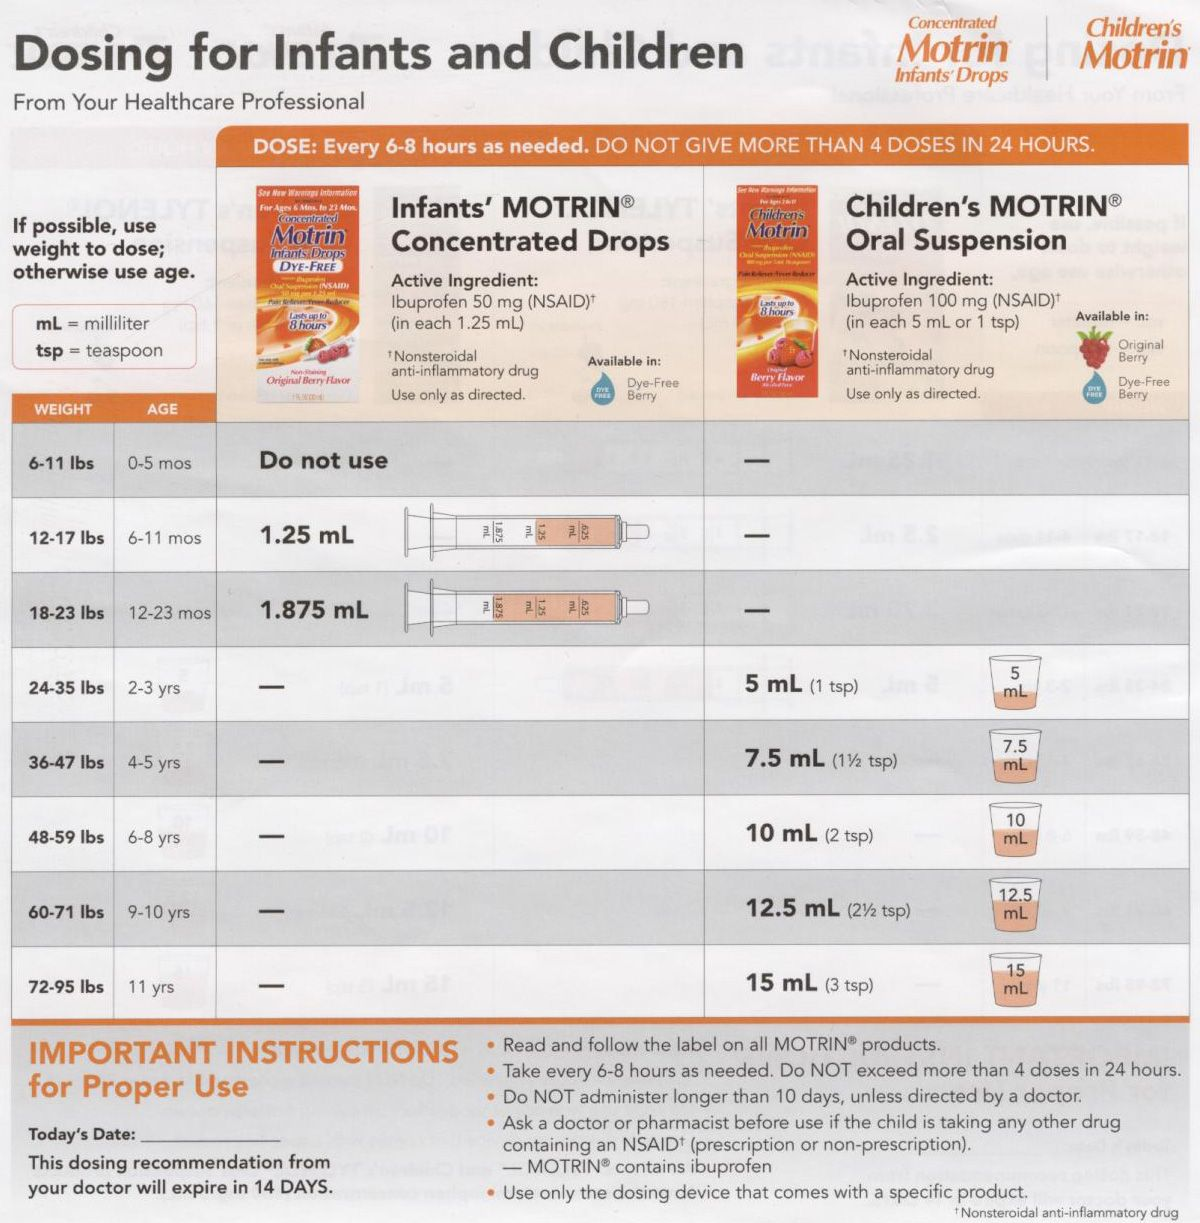 Infant tylenol dosage chart google search oliver james